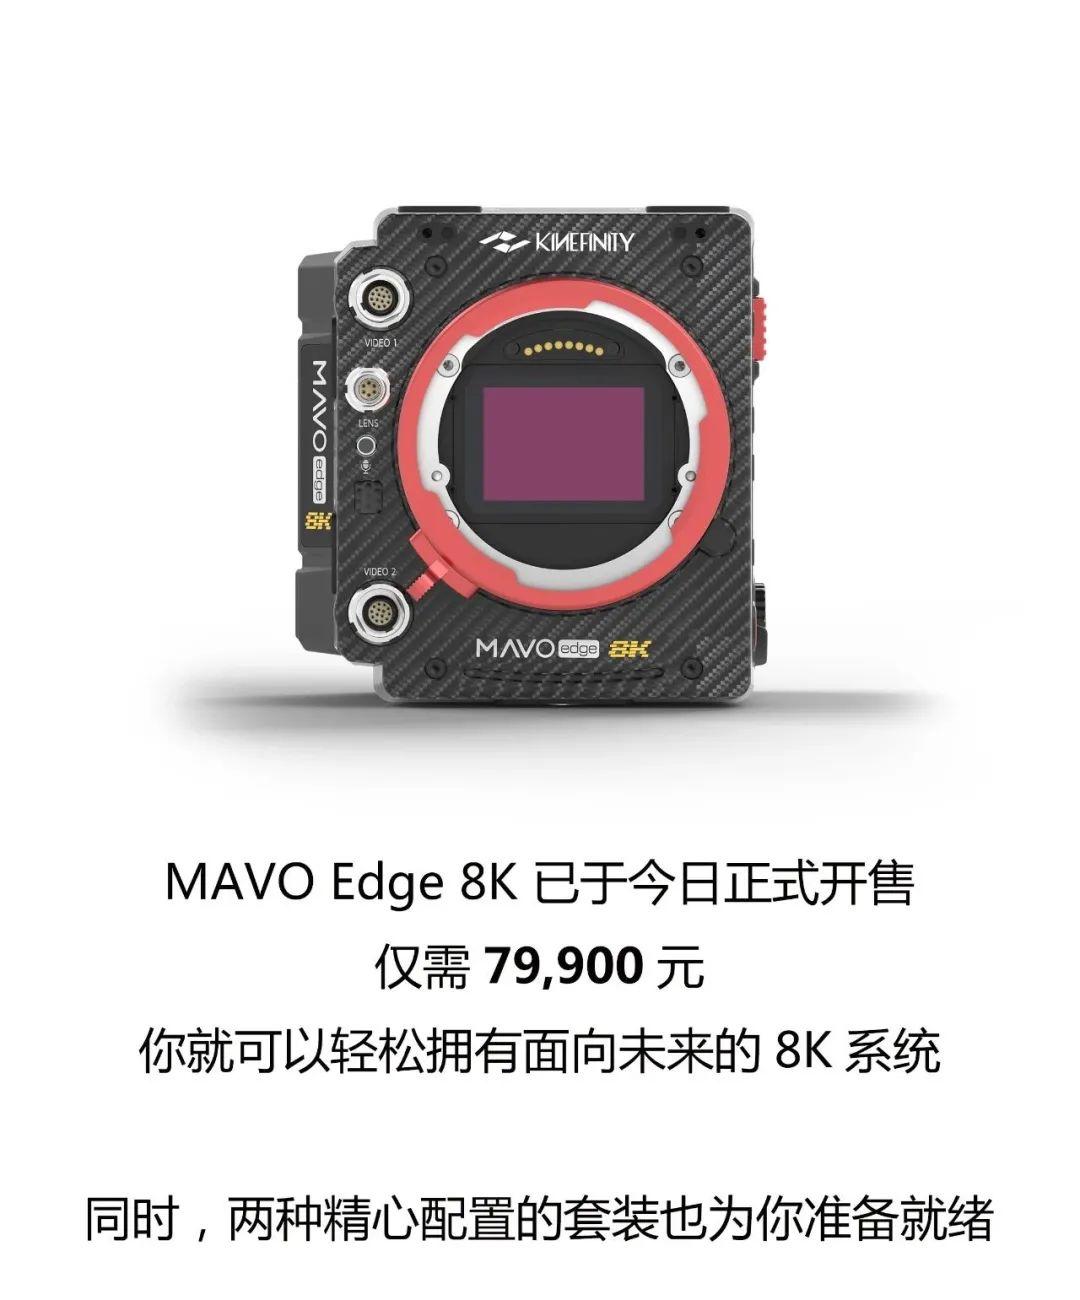 MAVO Edge 8K 正式发售! 8K摄影机 第10张